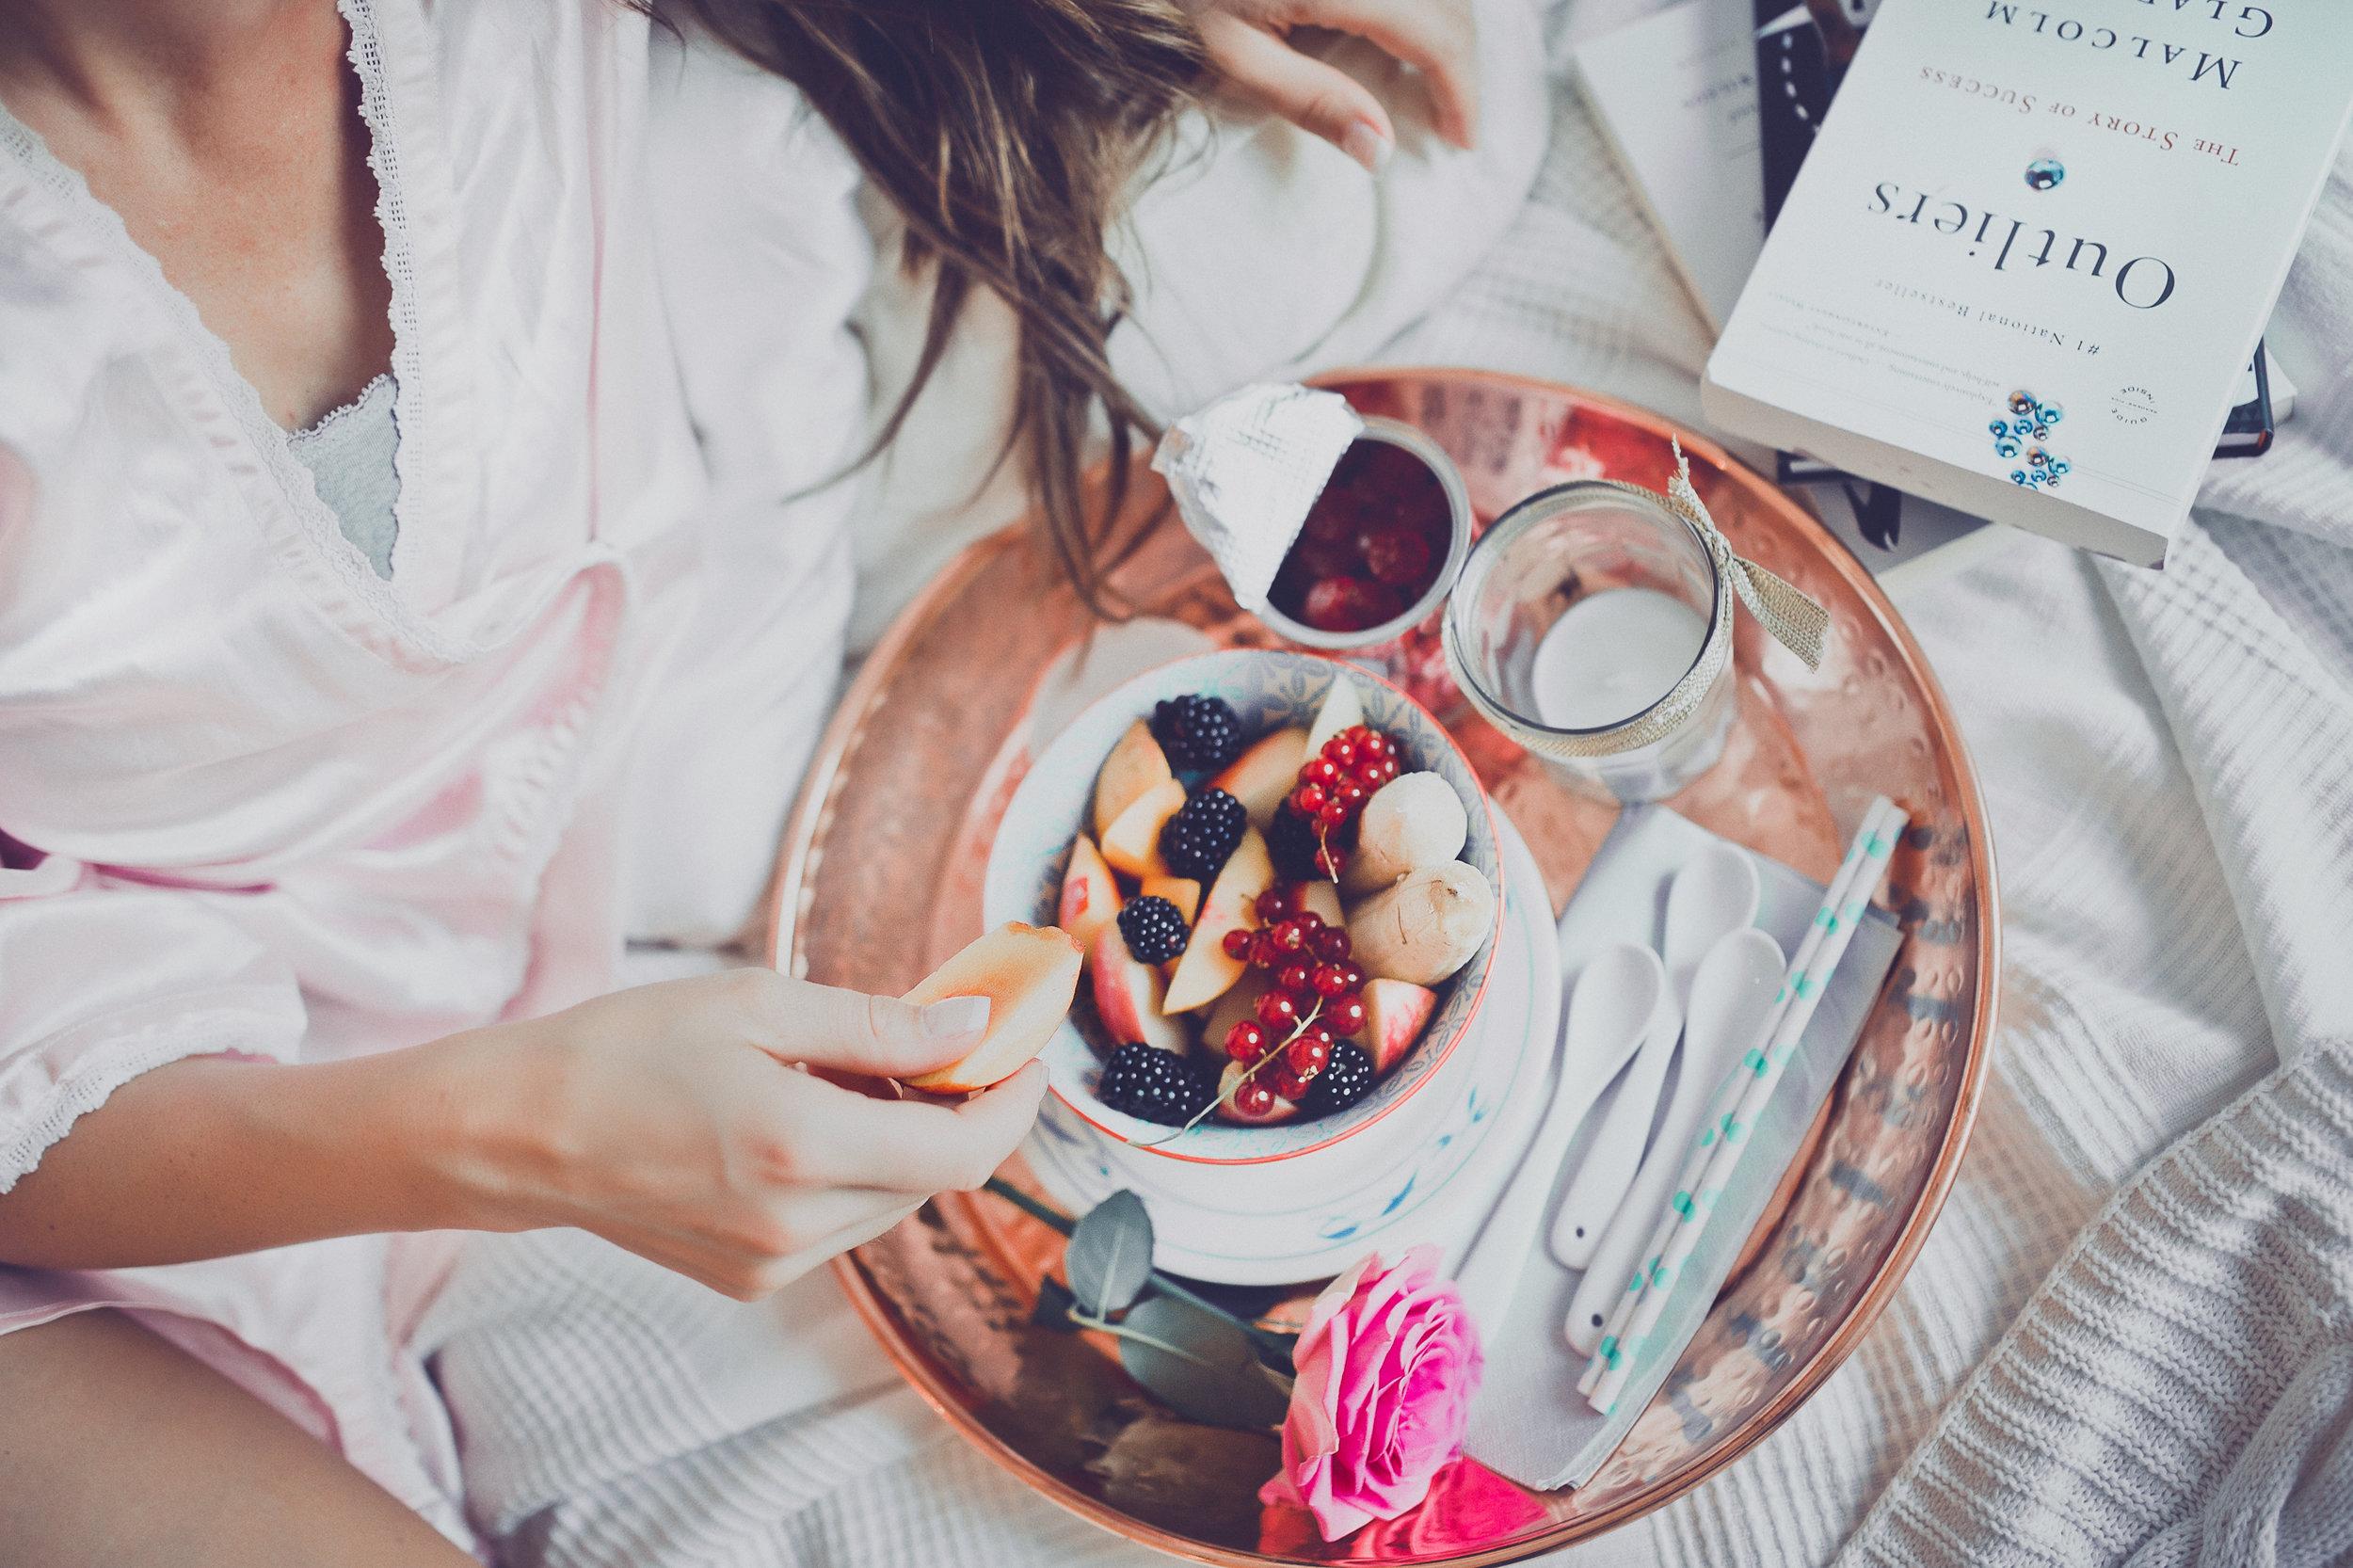 5 Easy Breakfasts in Bed My Luxury Linen